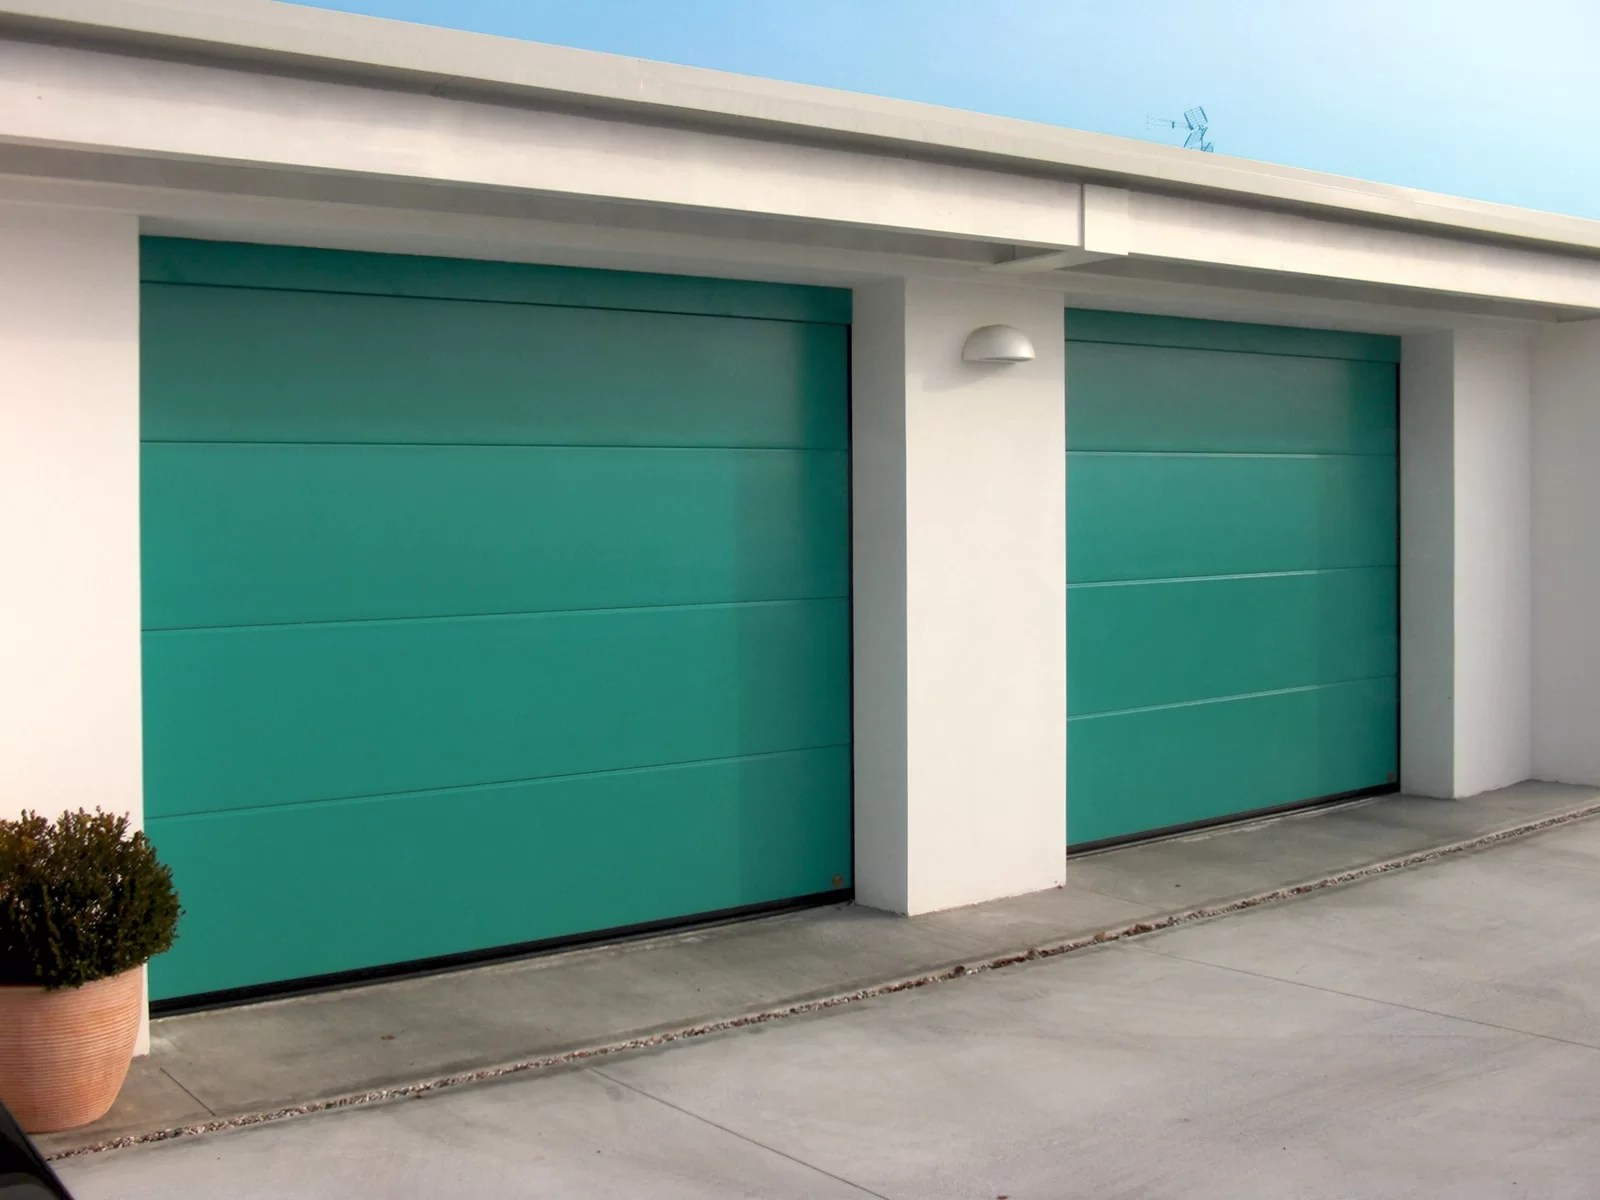 Portone sezionale da garage PERSUS - Liscio verde acqua RAL